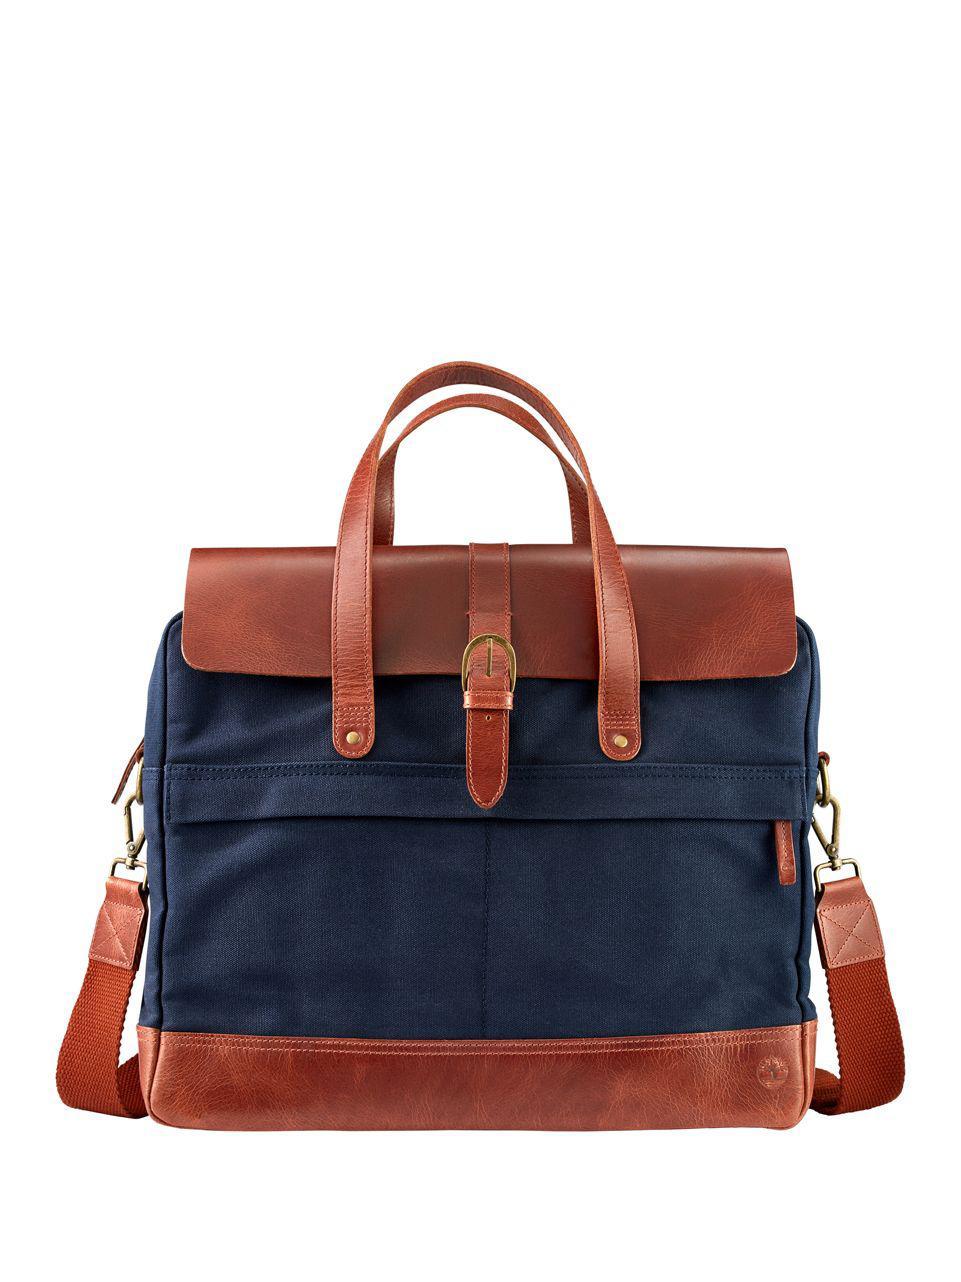 f7b86b29ffe Timberland Nantasket Briefcase in Blue for Men - Lyst